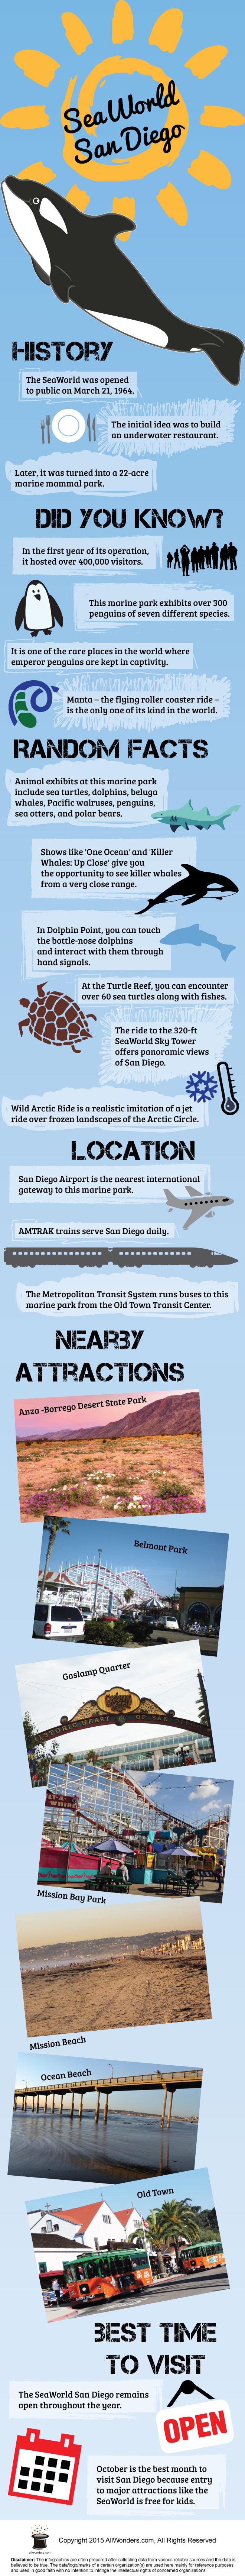 Seaworld San Diego Infographic